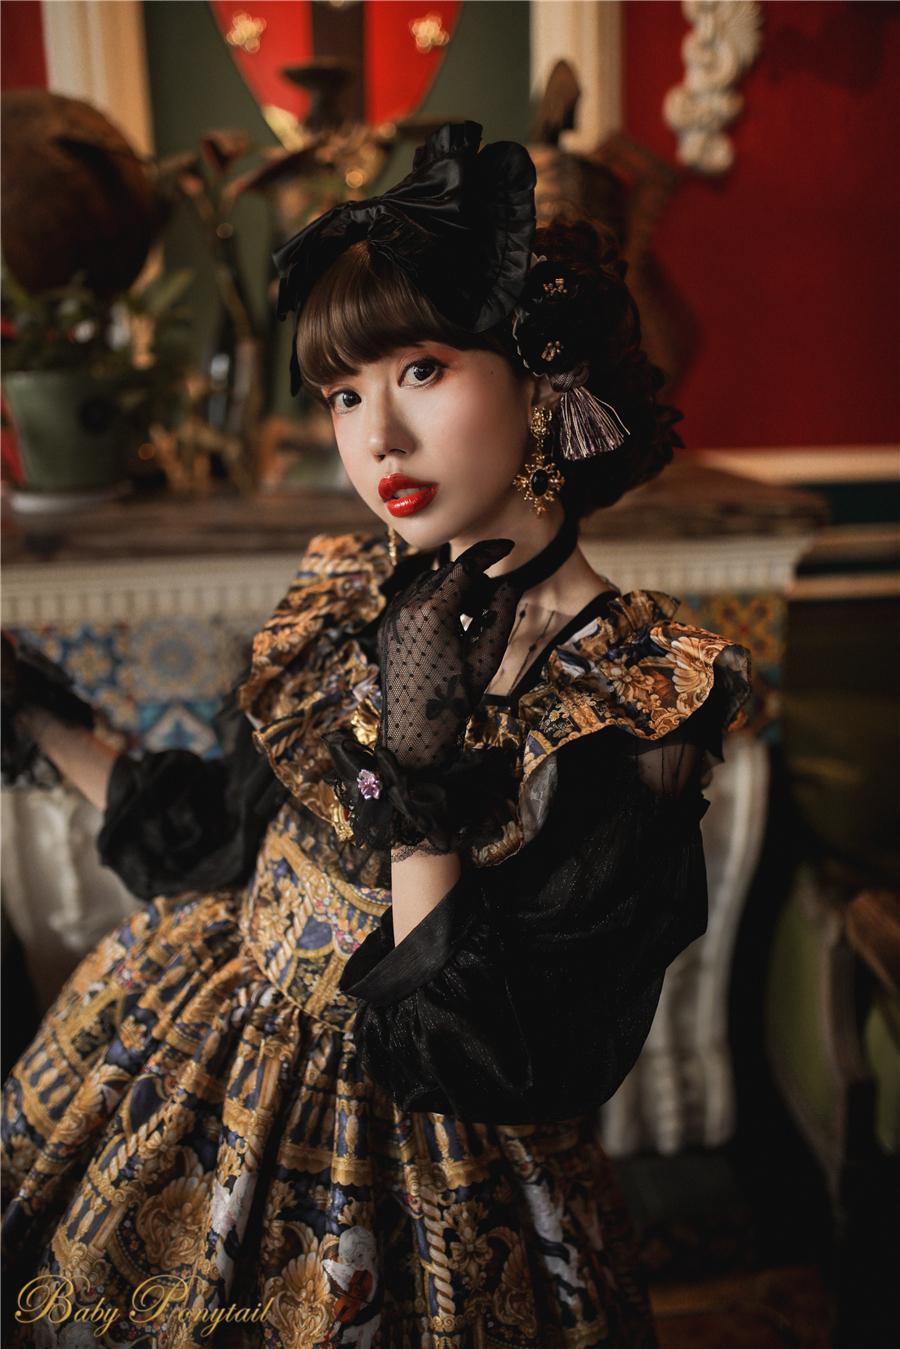 Babyponytail_Model_Ruffle Collar JSK_Black Present Angel_Kaka_17.jpg